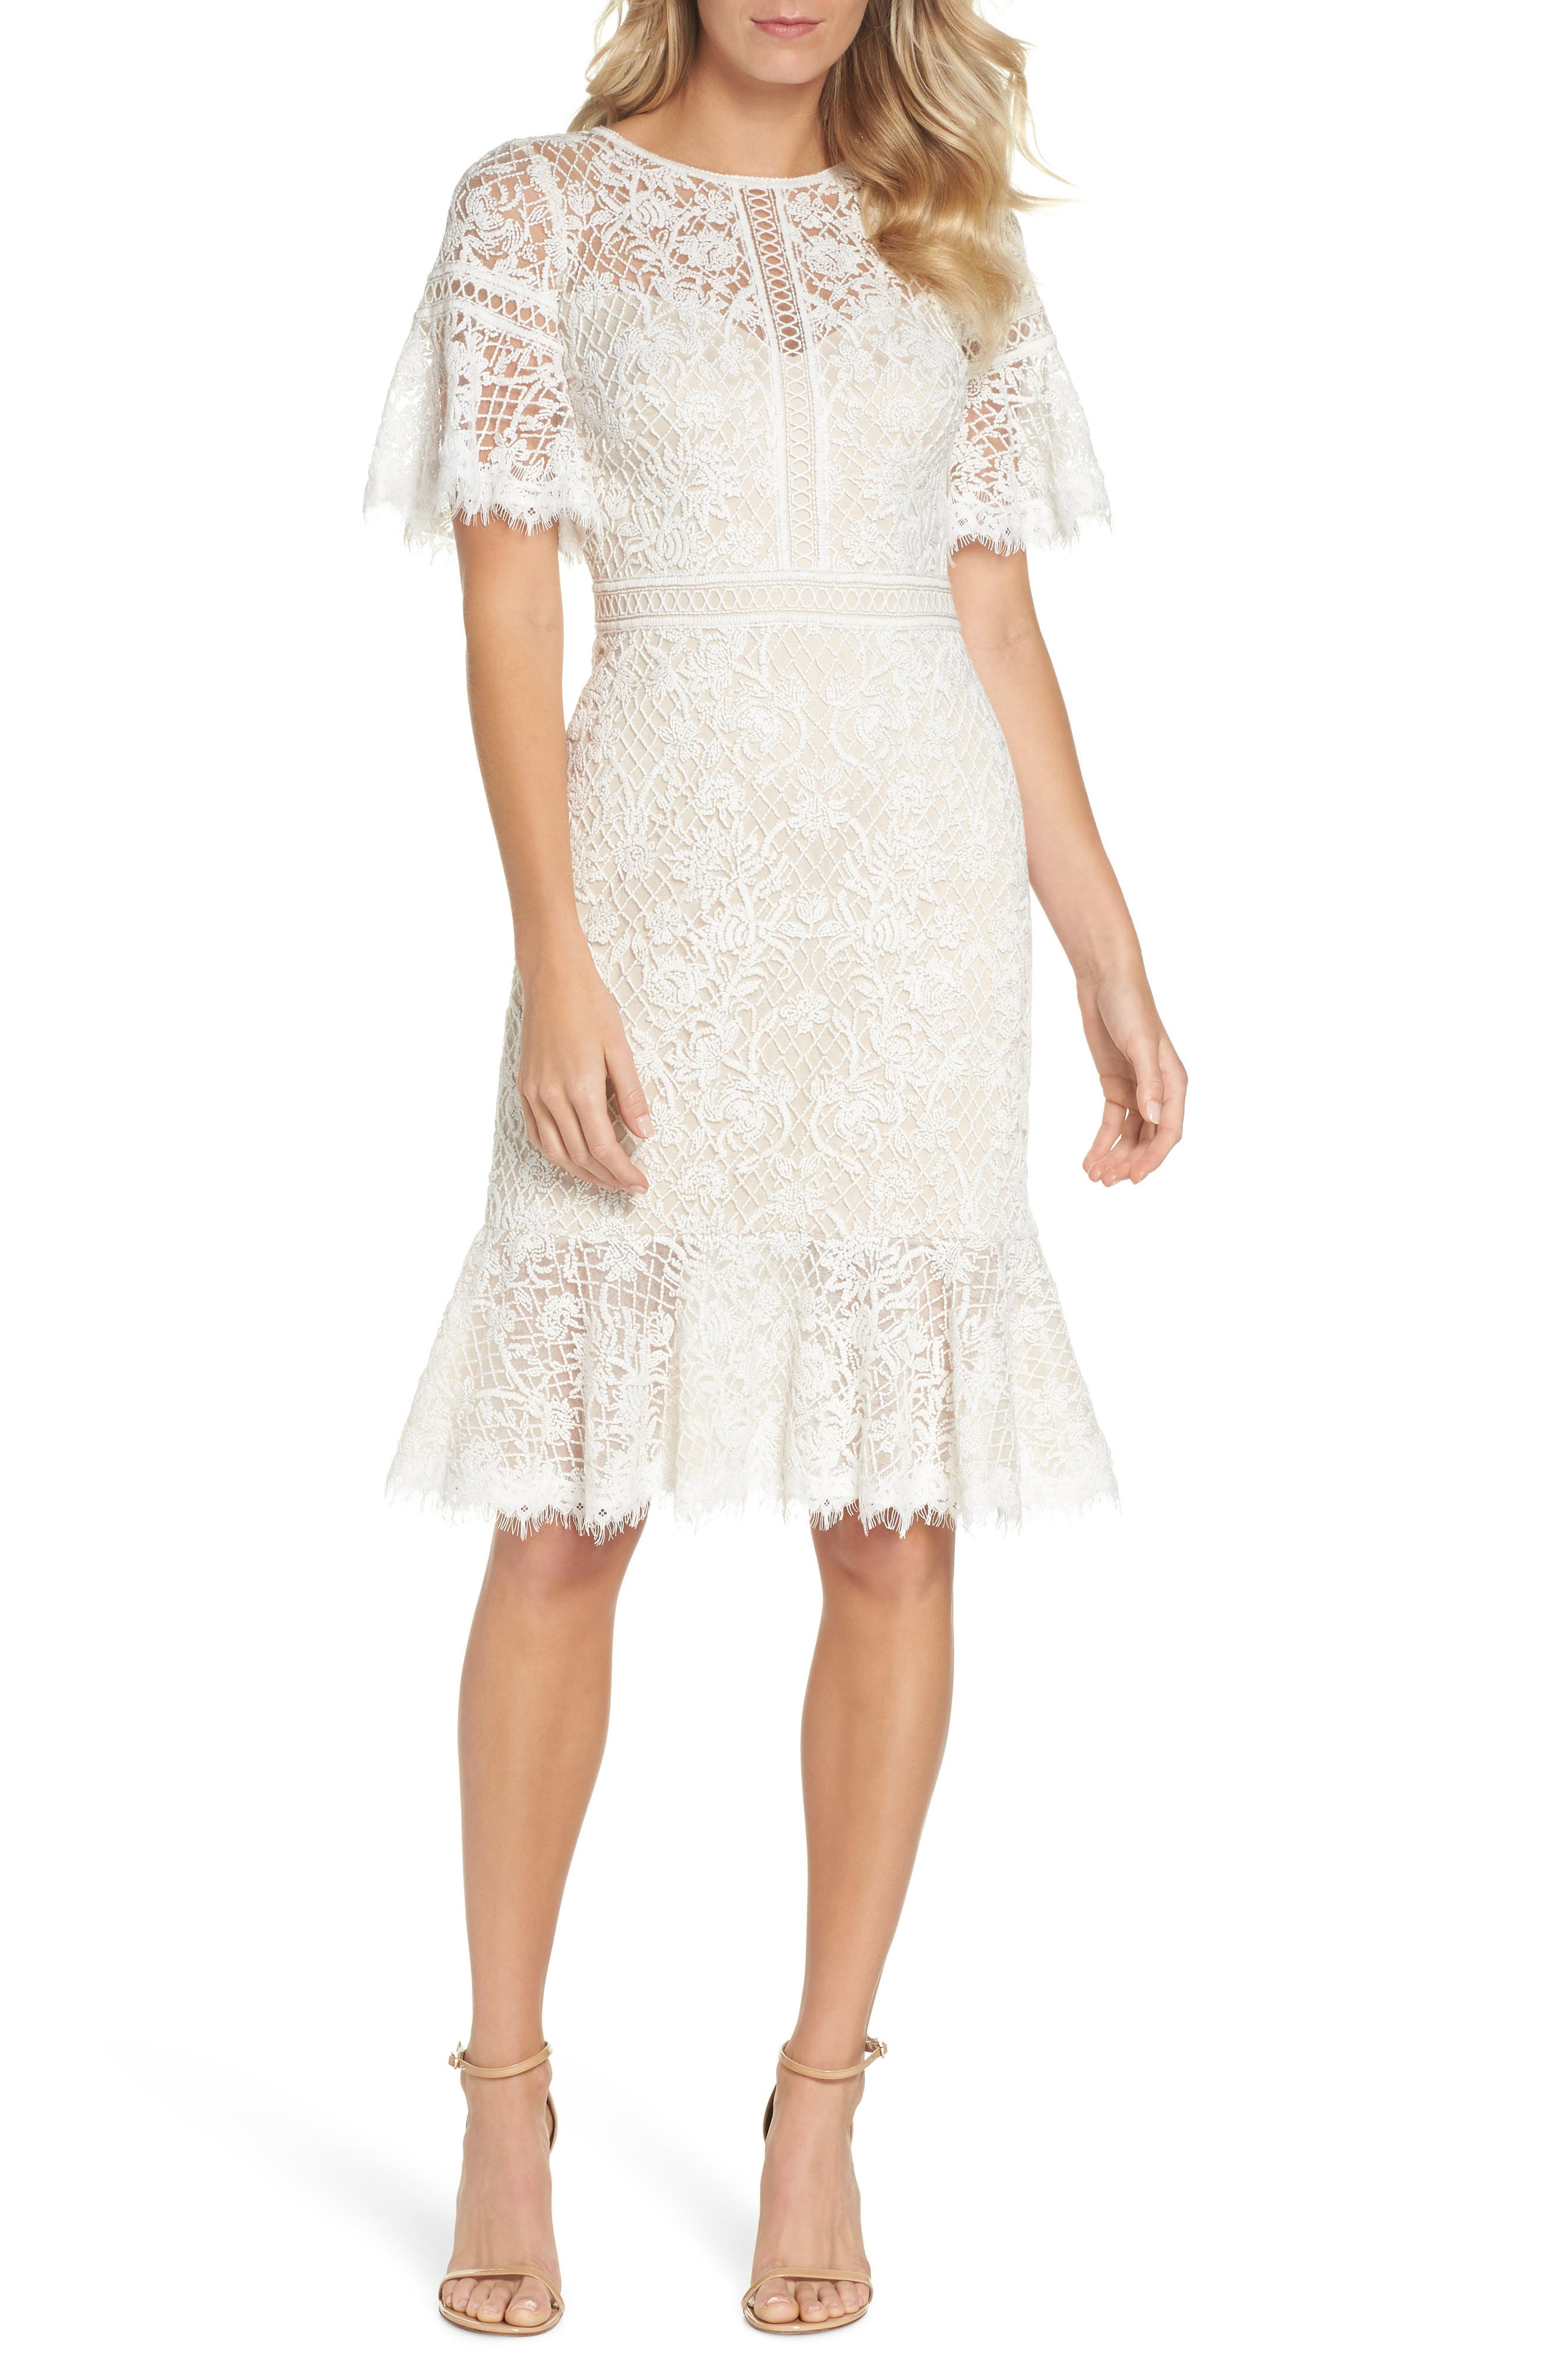 Embroidered Mesh Dress,                             Main thumbnail 1, color,                             IVORY/ NATURAL